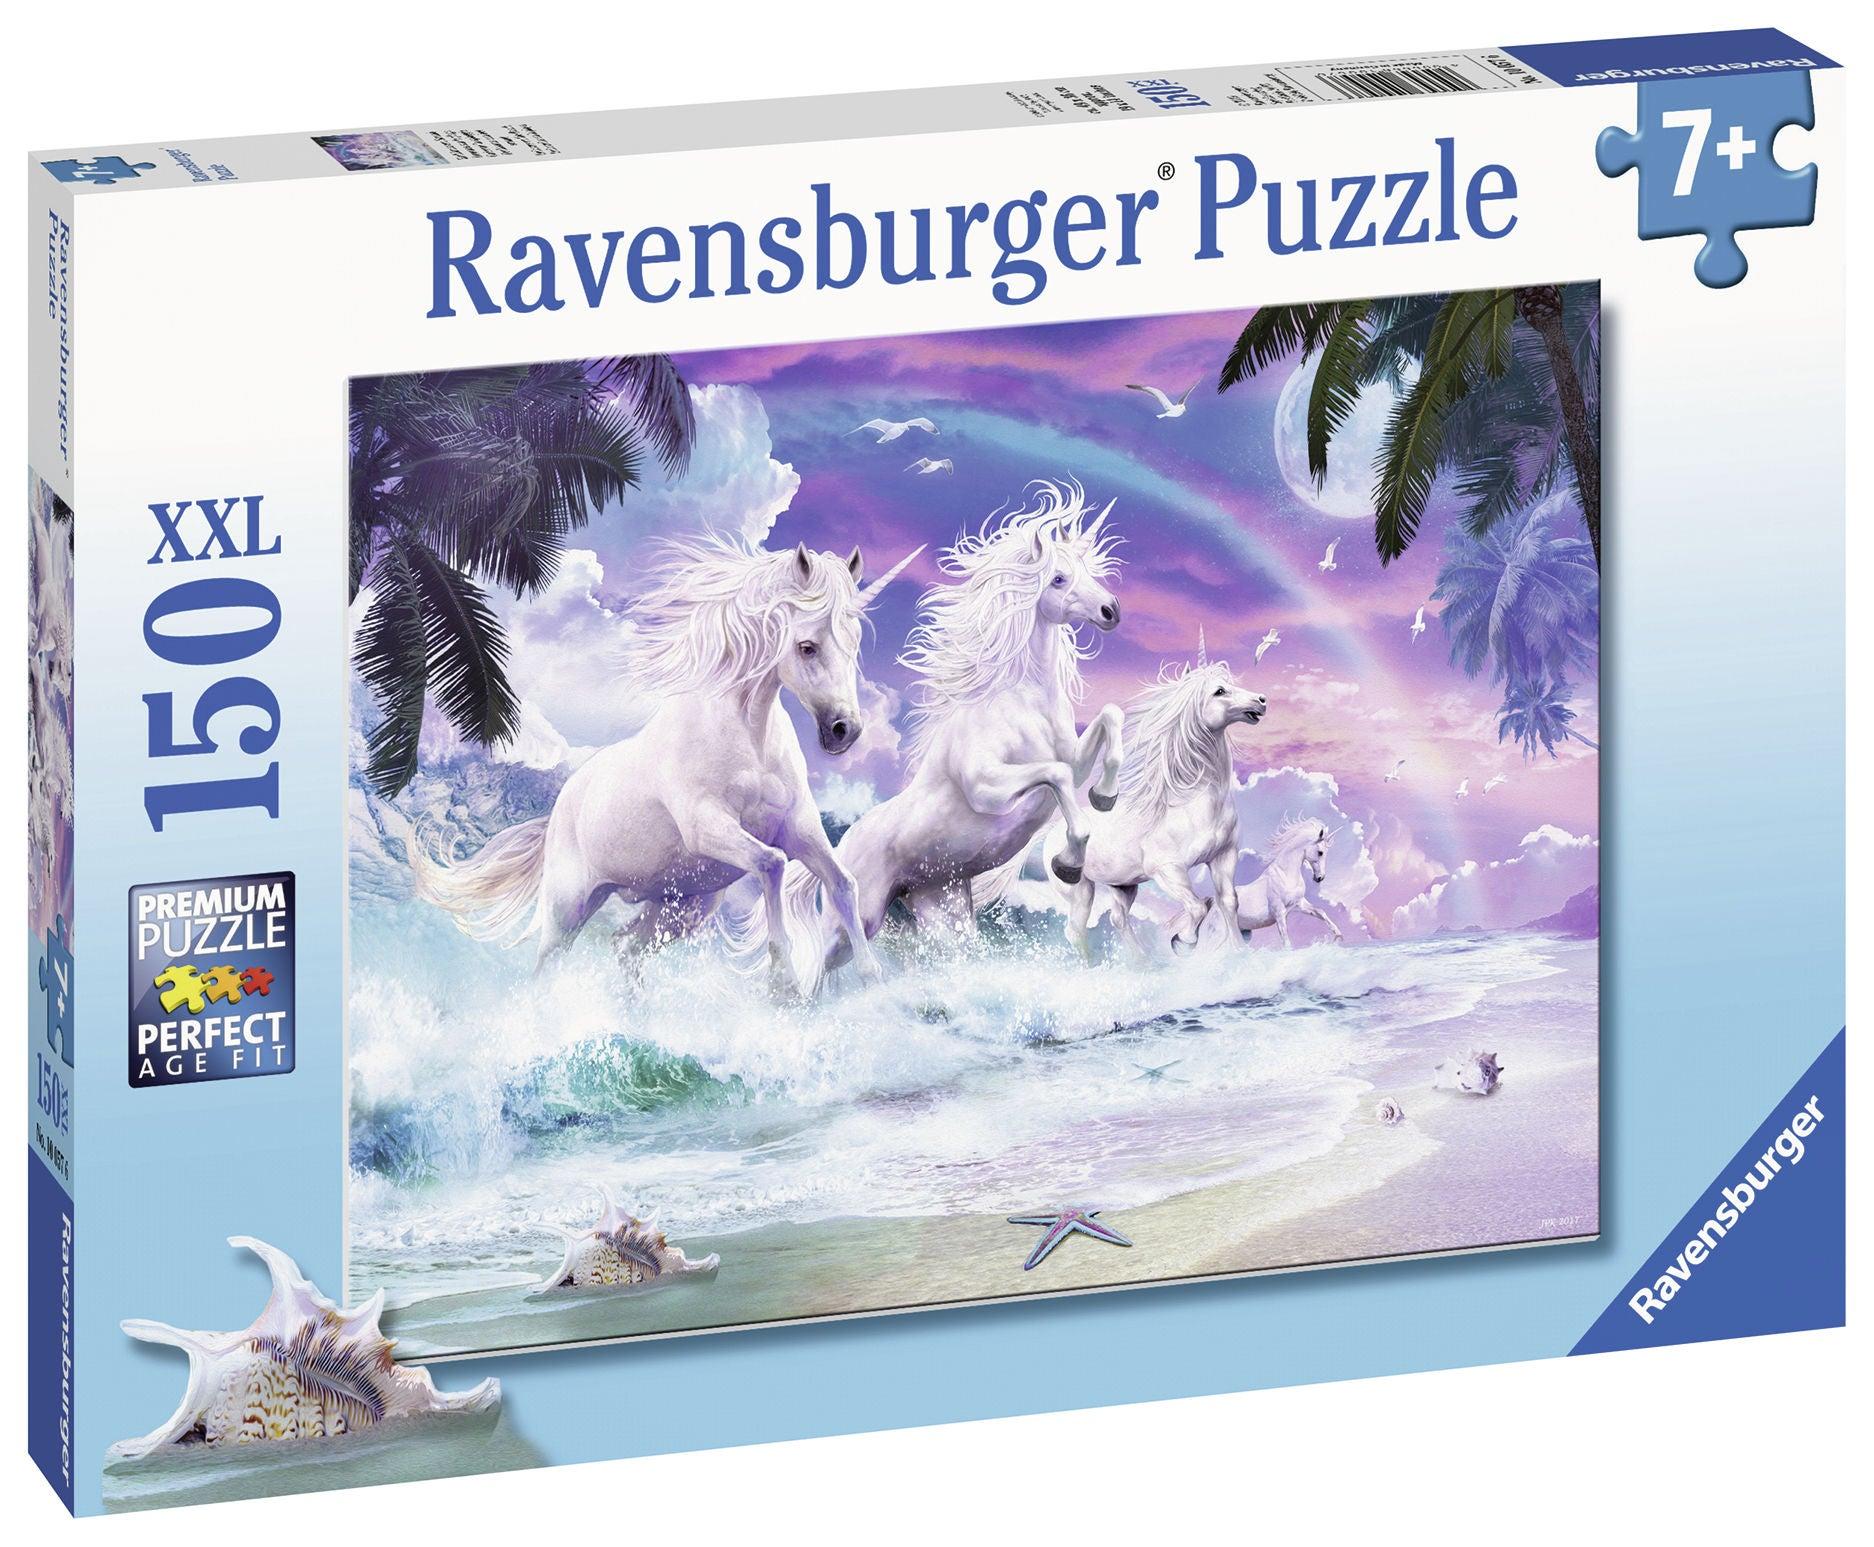 Ravensburger Pussel Enhörningar På Strand 150 Bitar